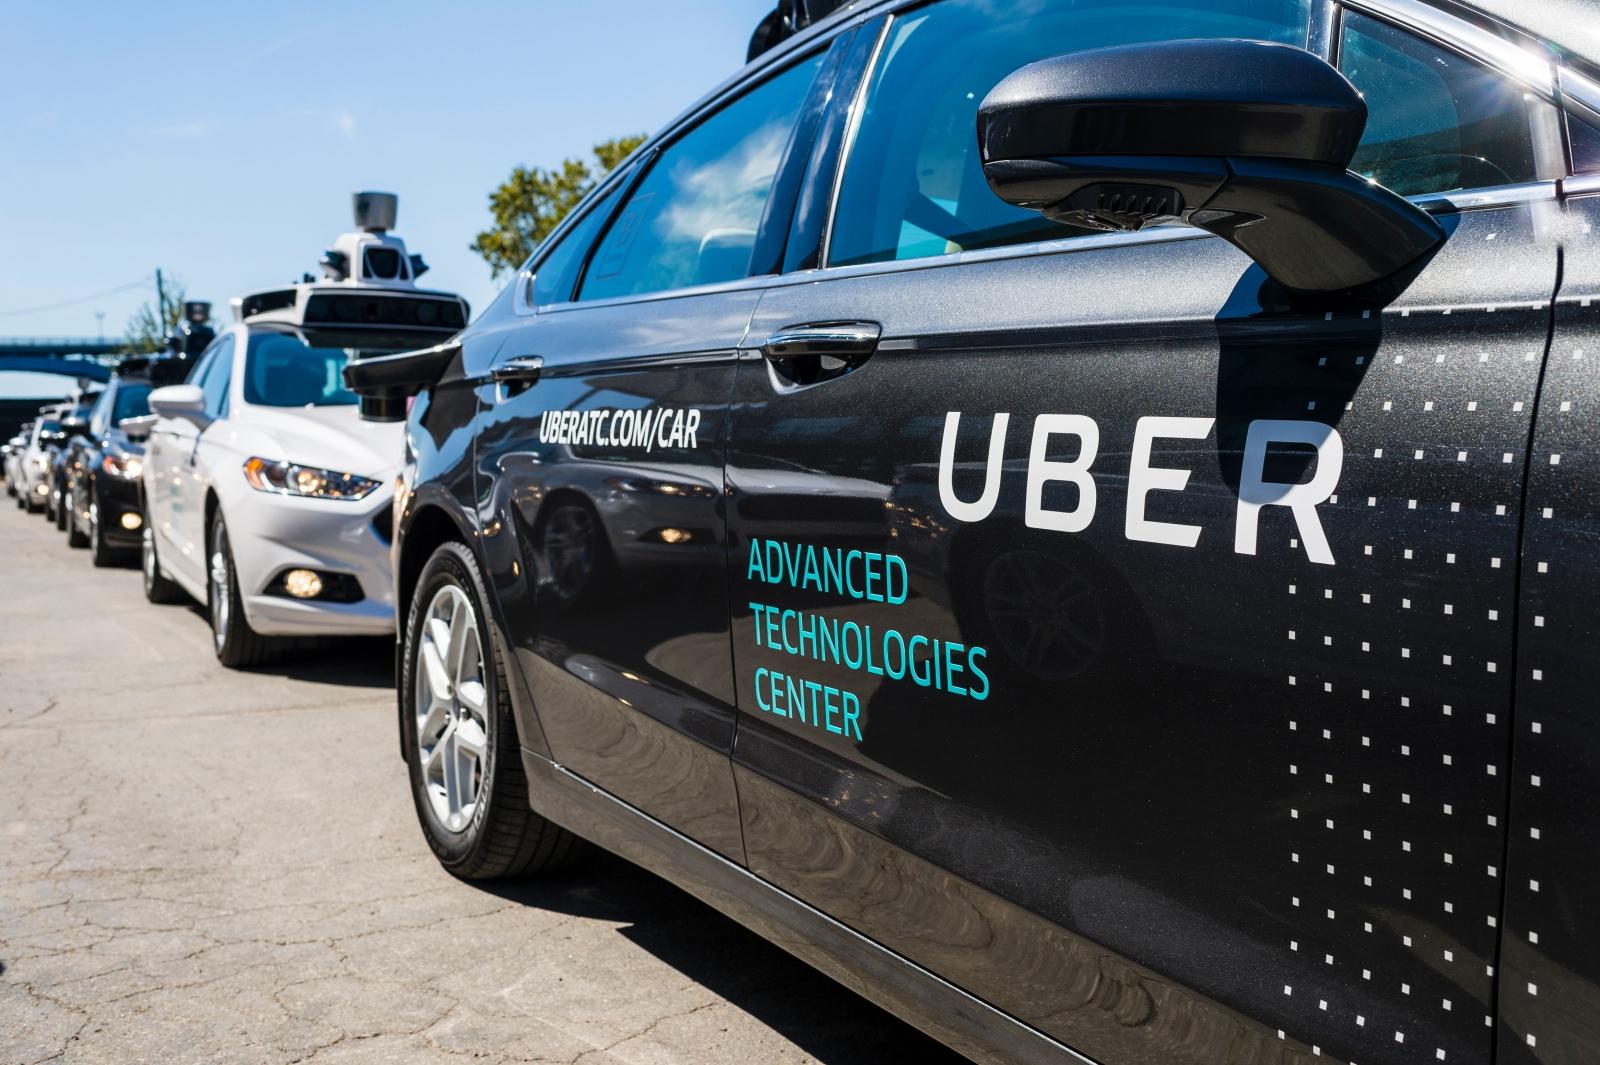 Uber self-driving cars